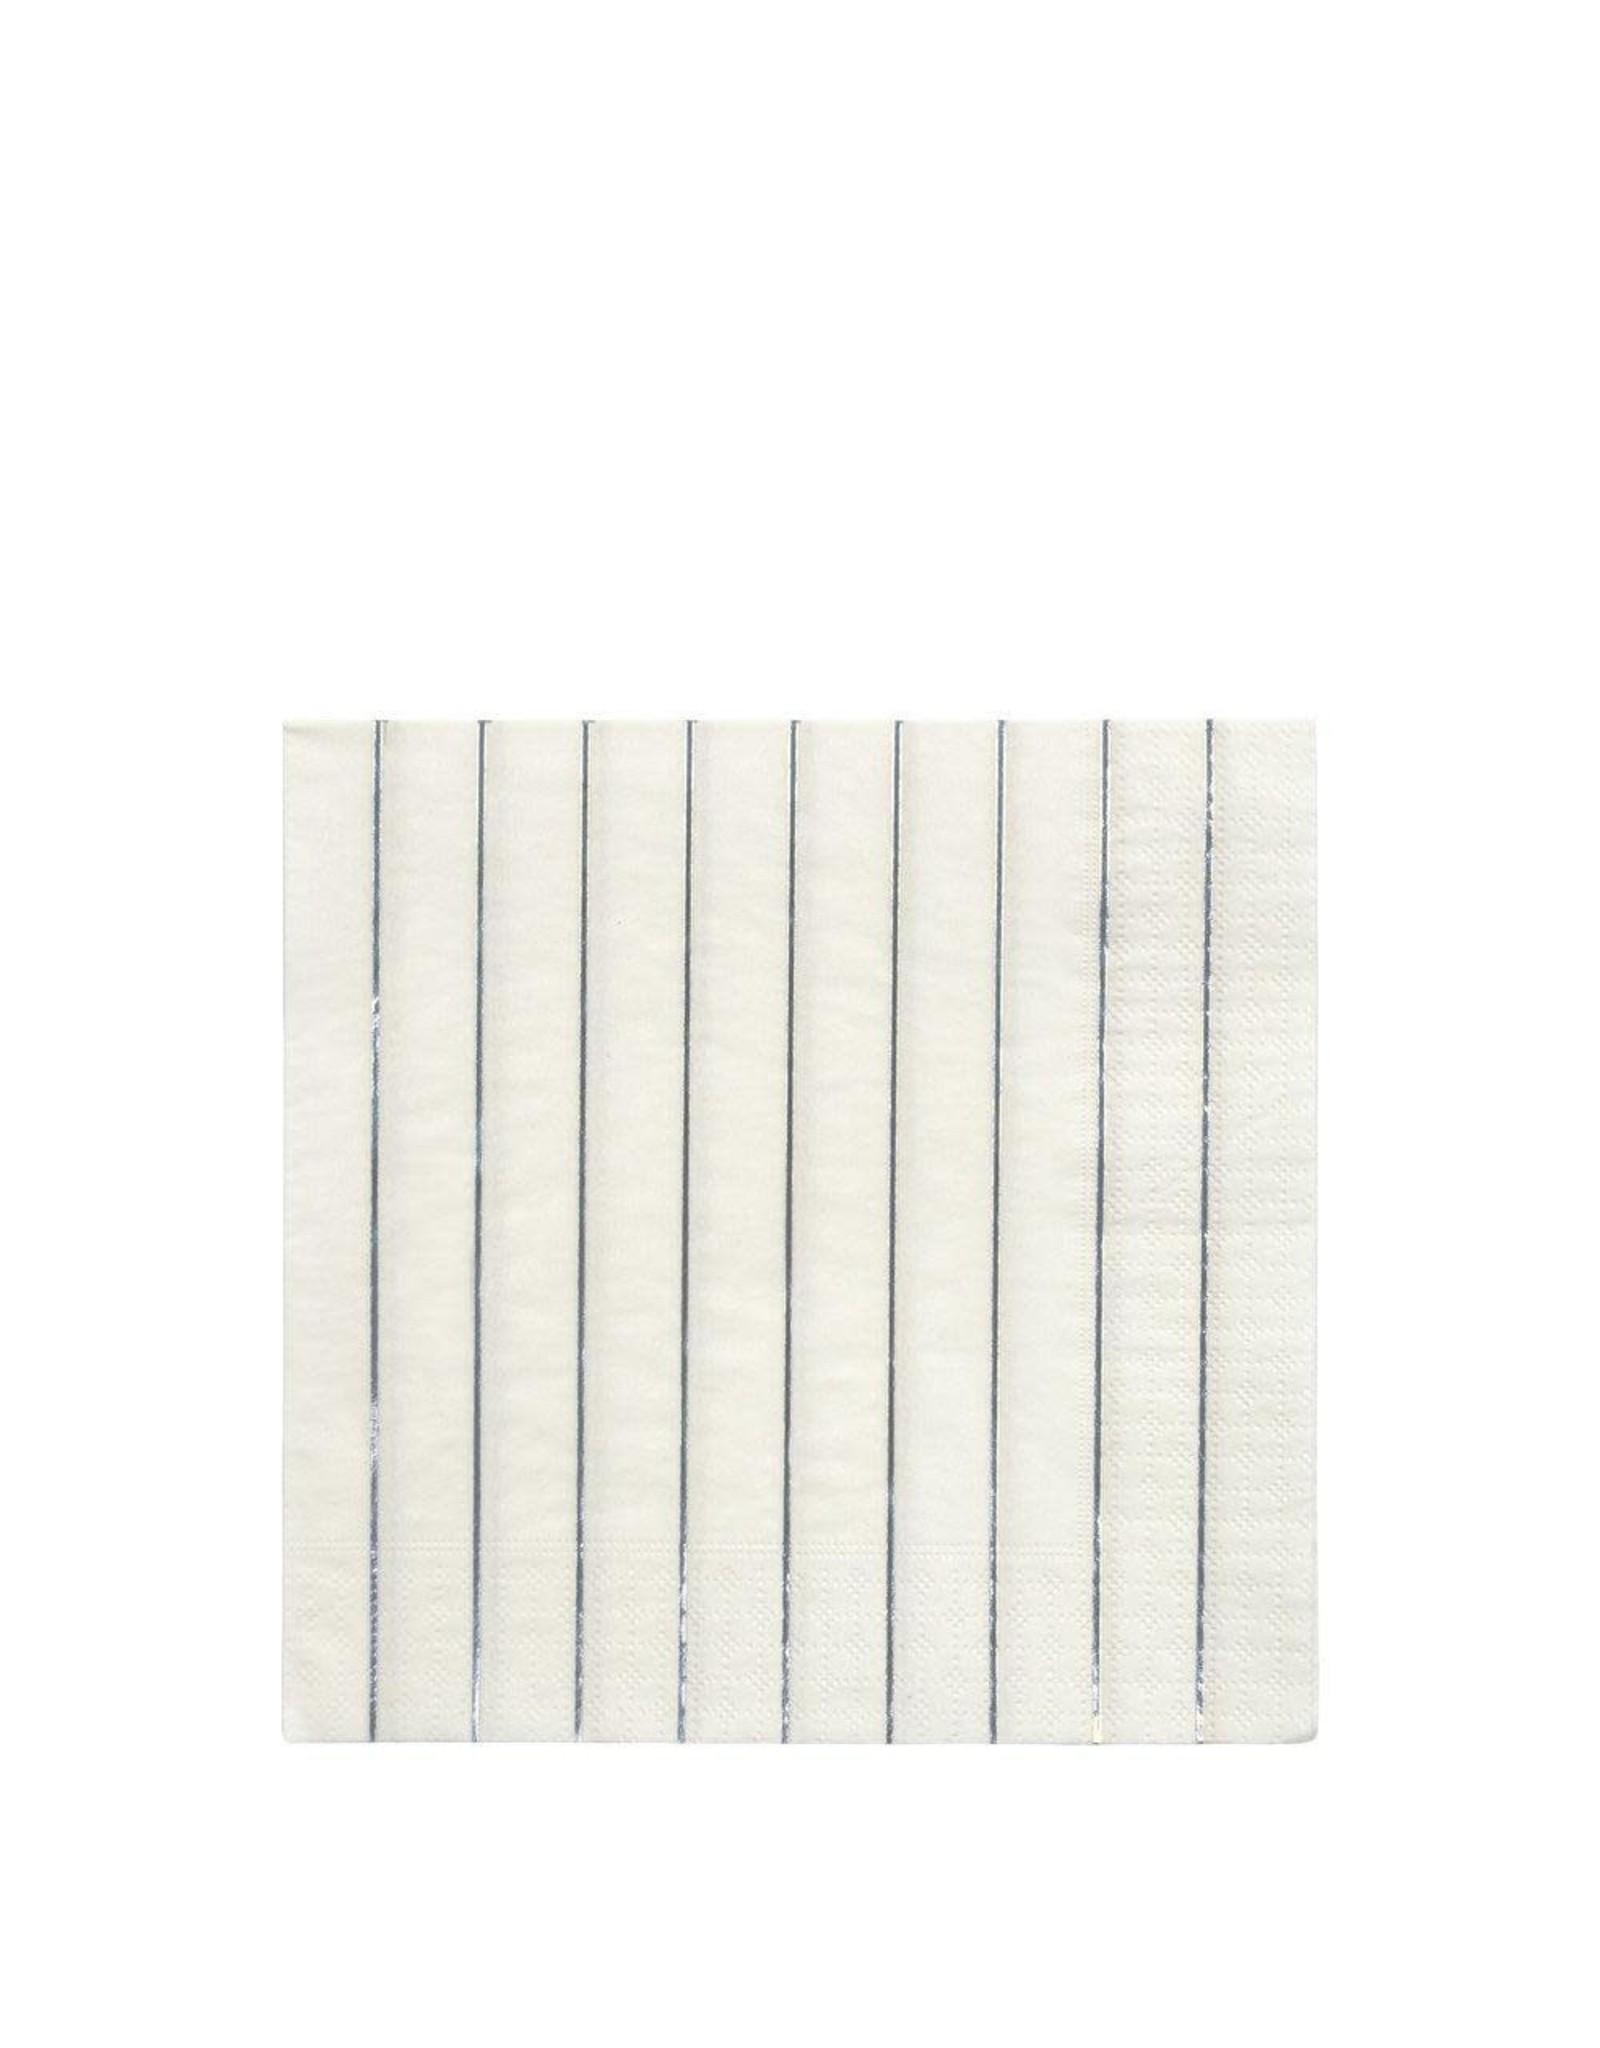 Meri Meri Serviettes | Zilver strepen | 16st | 10 x 10cm